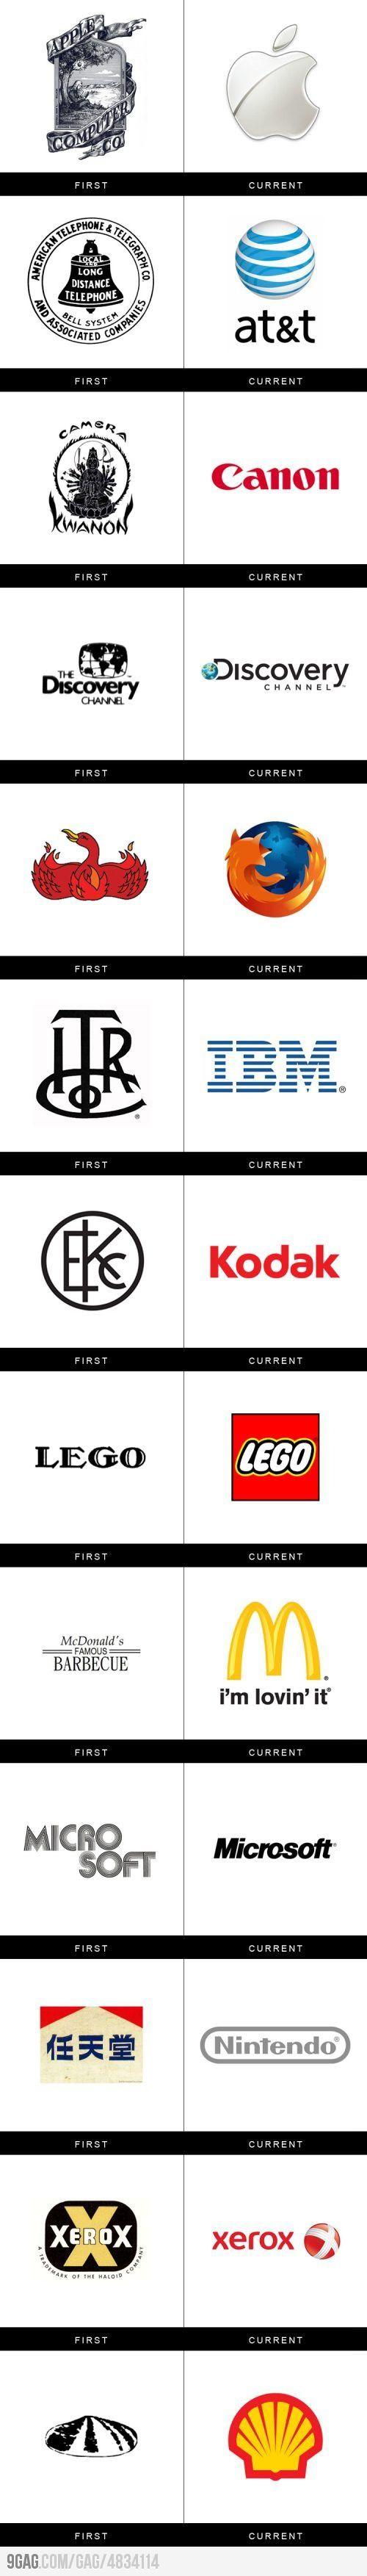 Evolution of Brand Logos (Infographic)